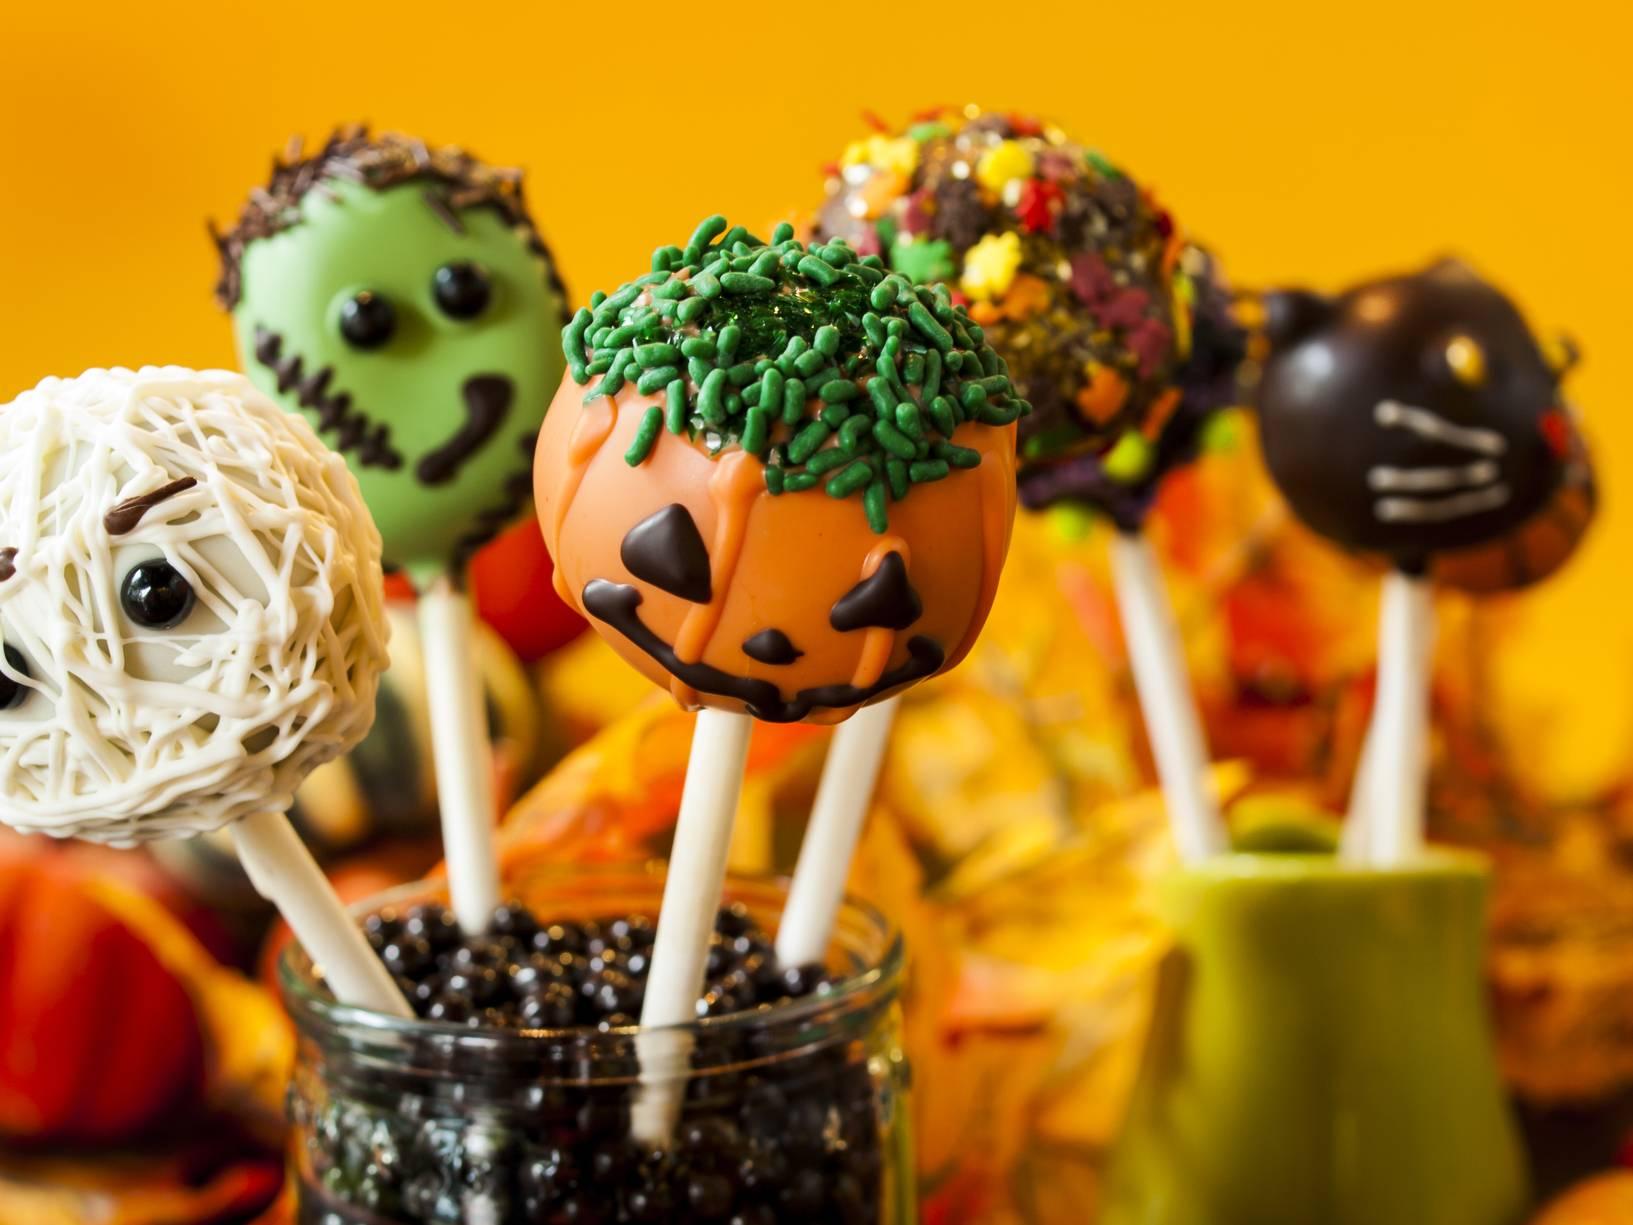 Рецепты блюд на хэллоуин с фото, что приготовить на хэллоуин на webspoon.ru